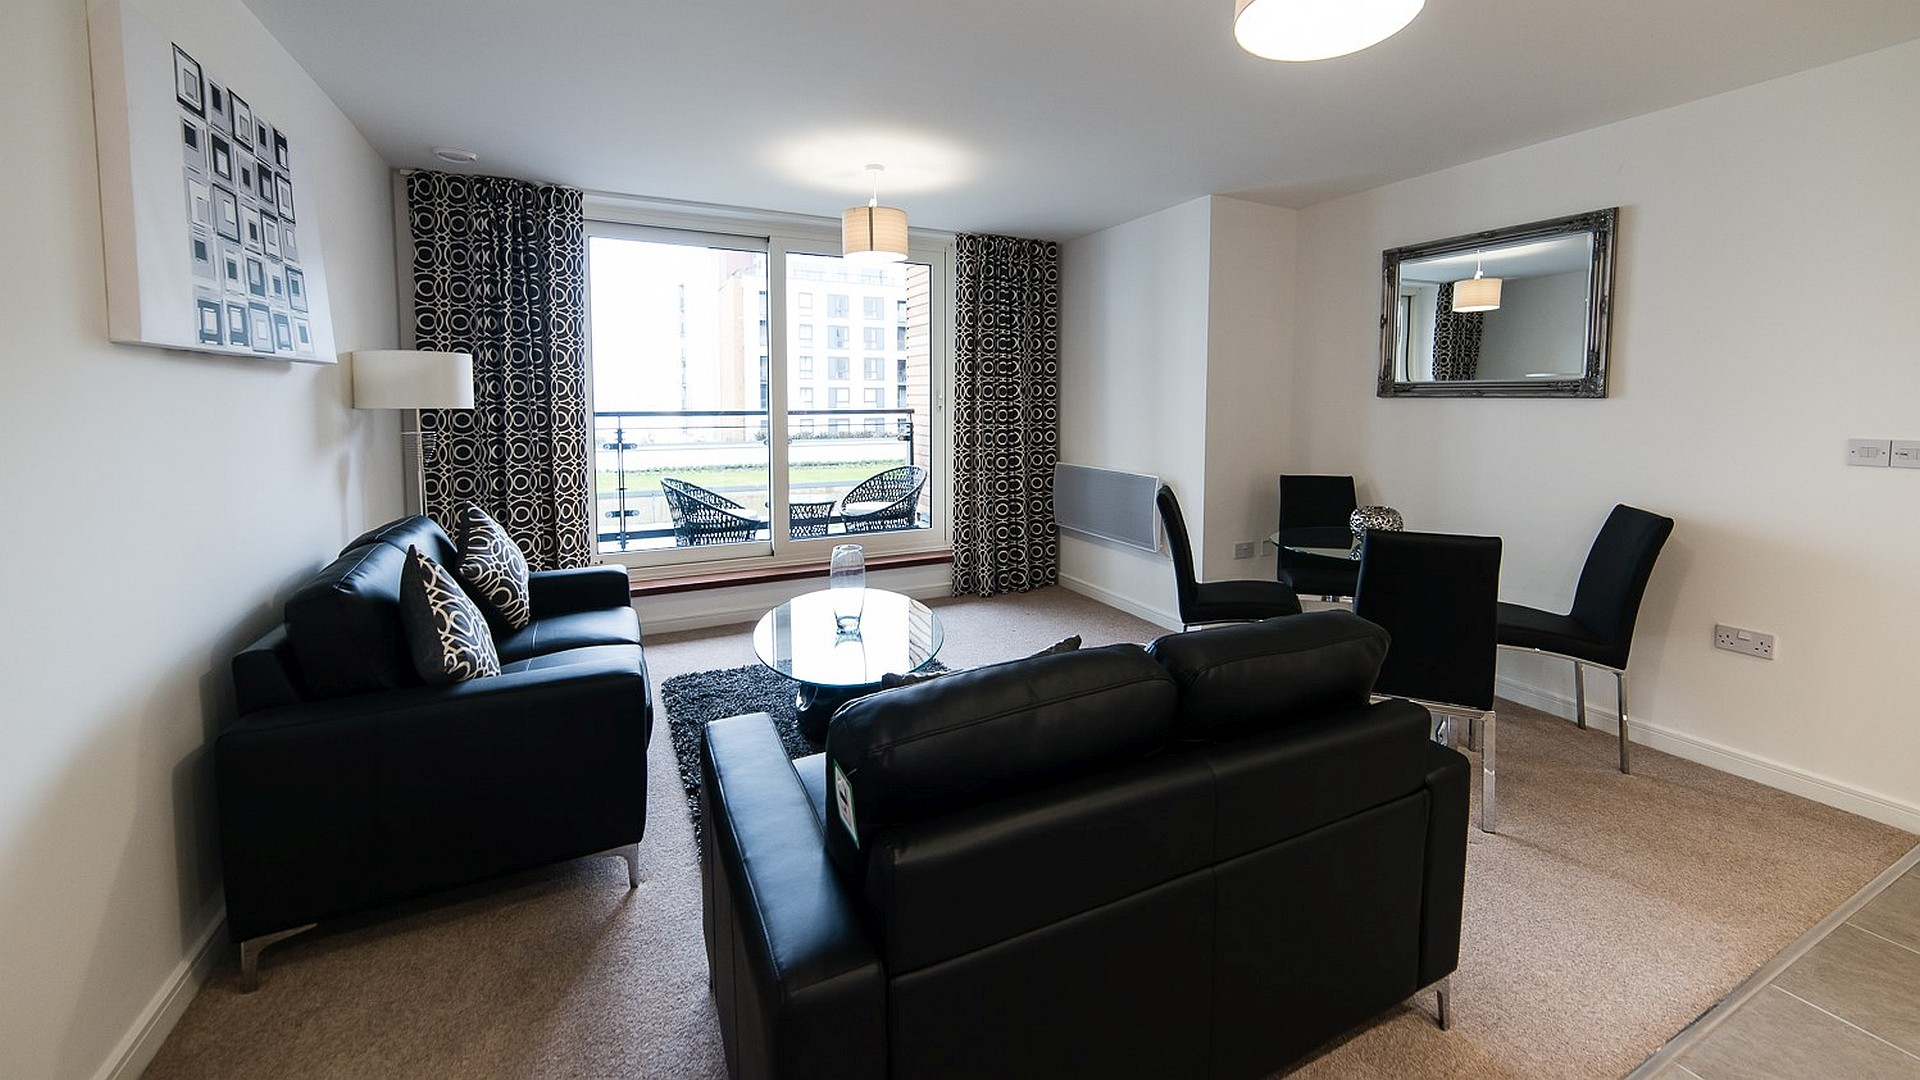 32 Davaar furnished living room use - Squarefoot Estate Agents